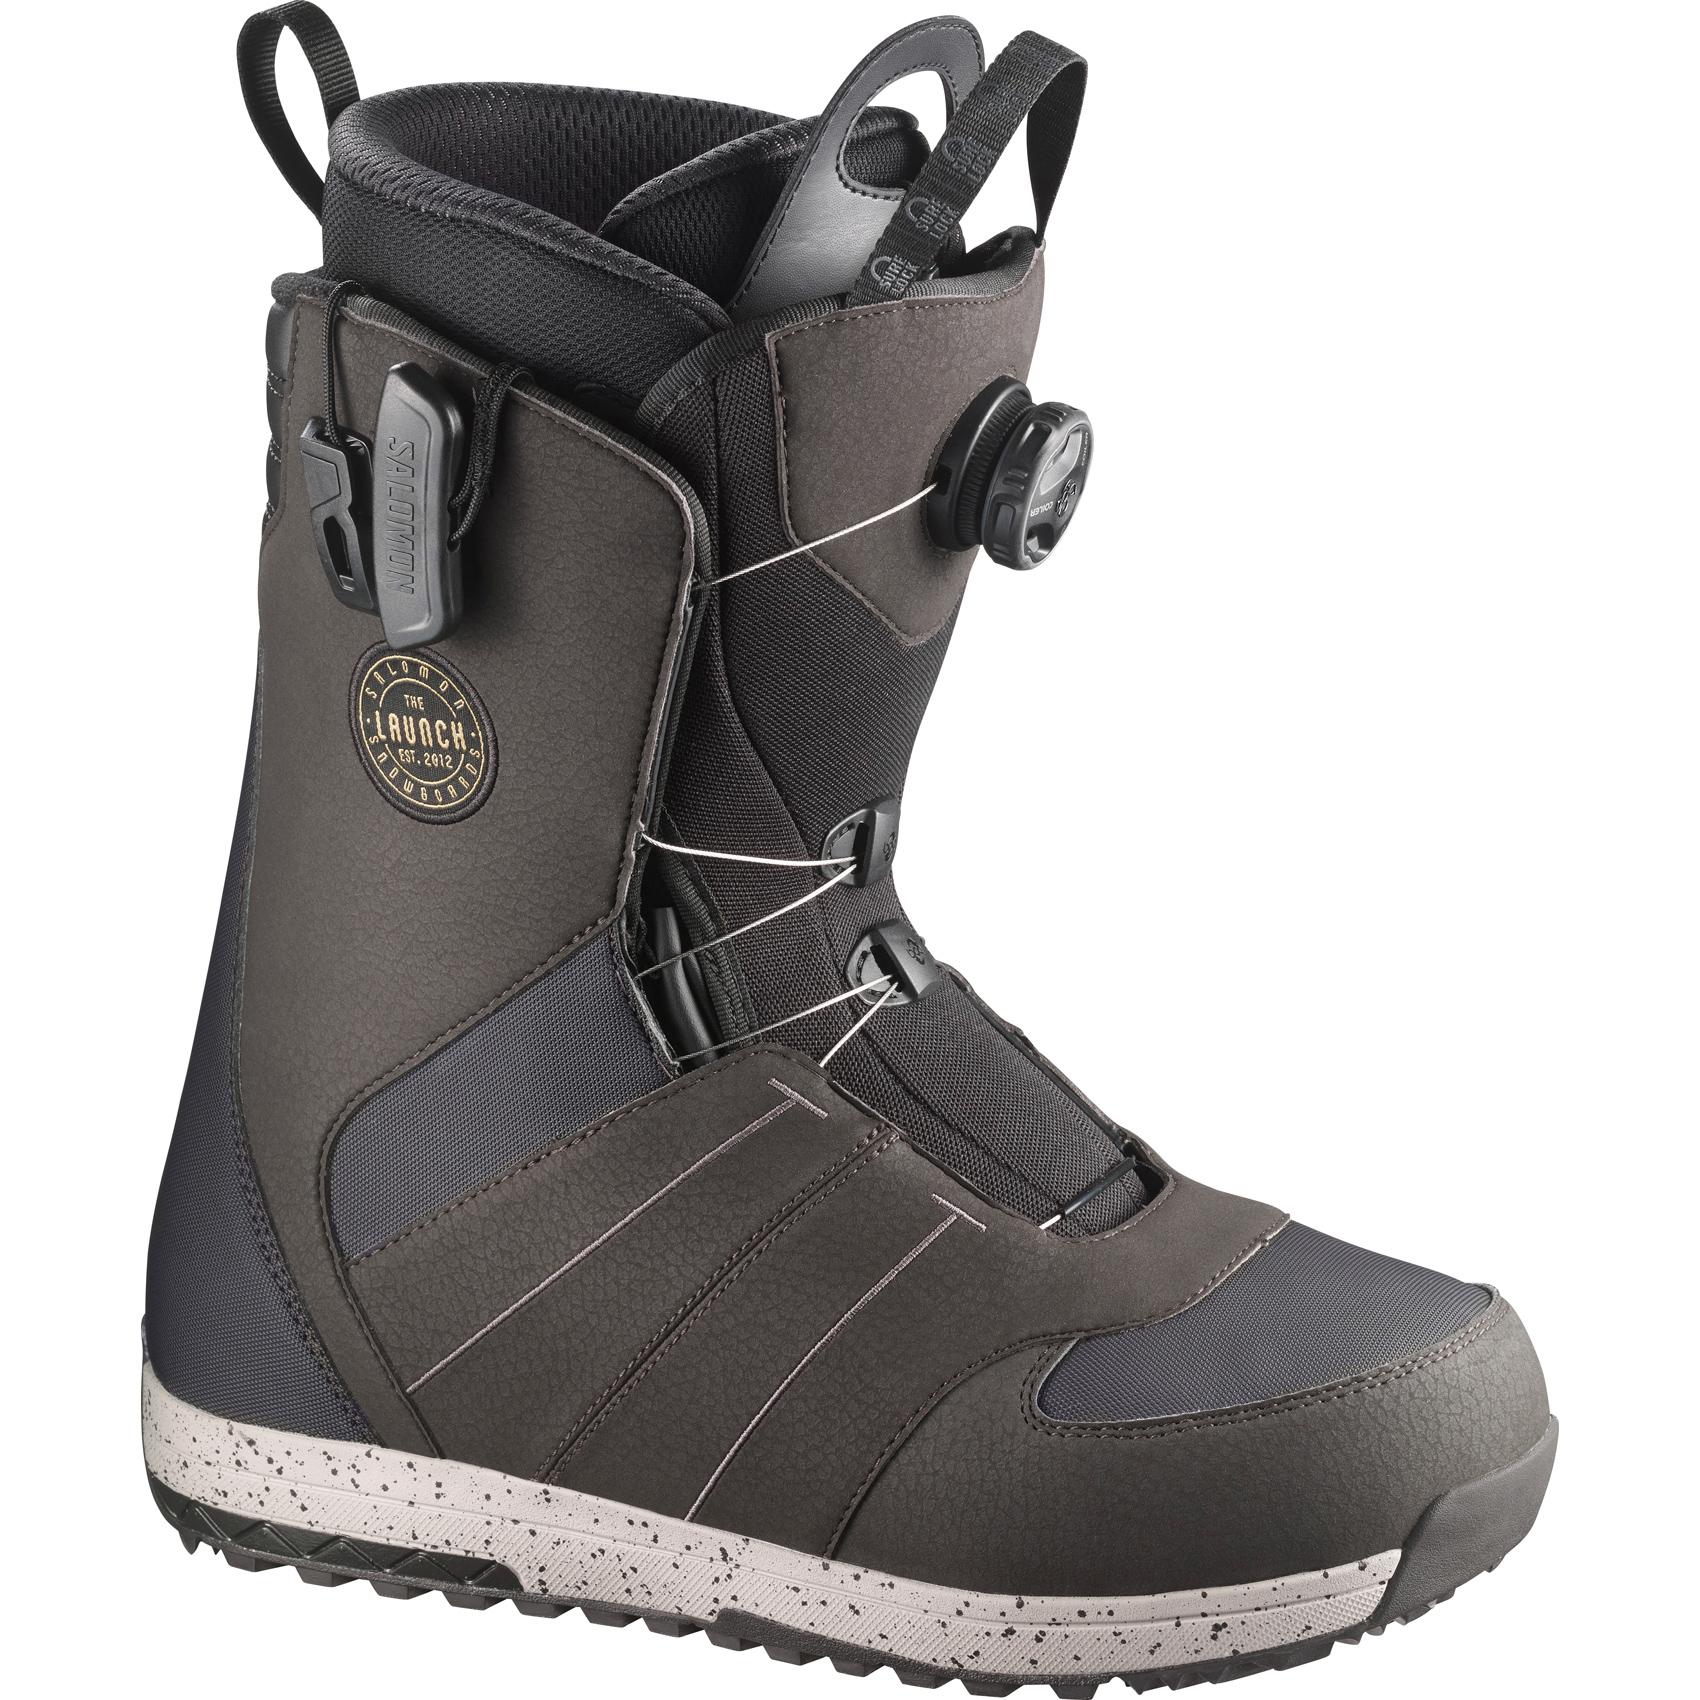 Salomon Launch BOA STR8JKT Mens Snowboard Boots UK 10.5 review